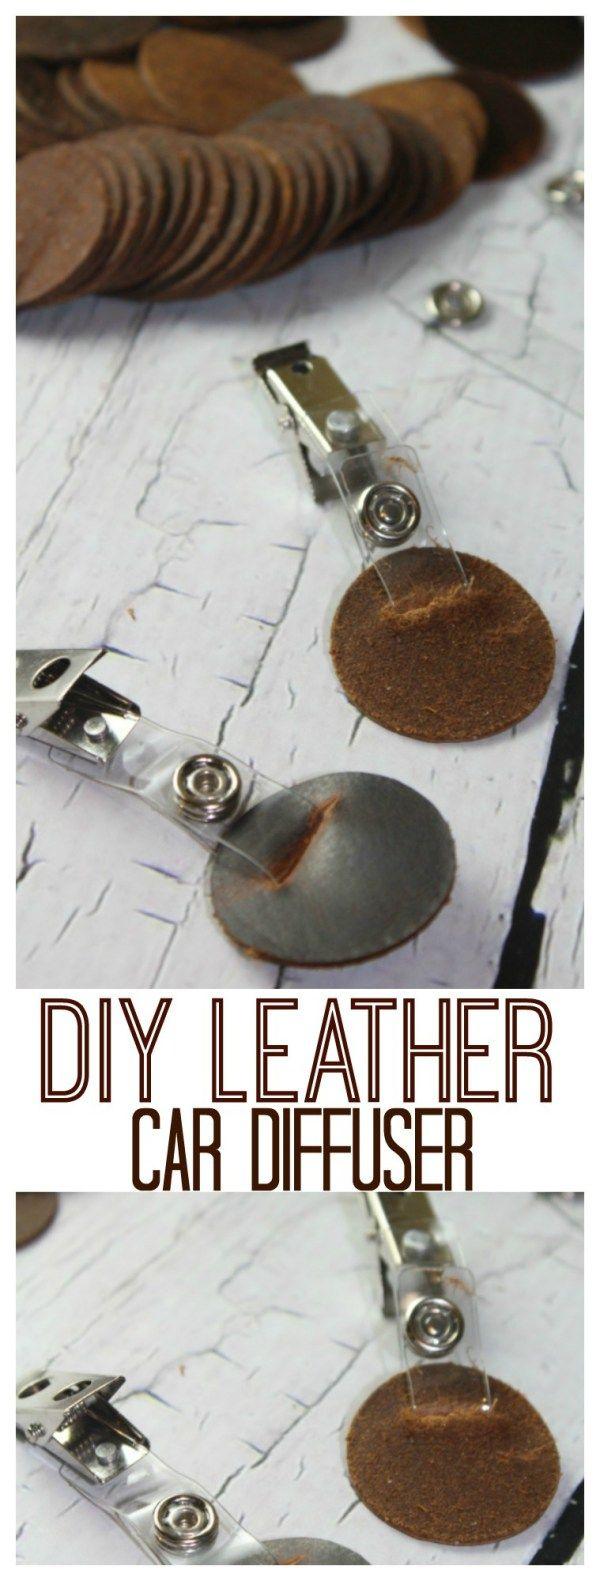 DIY Leather Car Diffuser